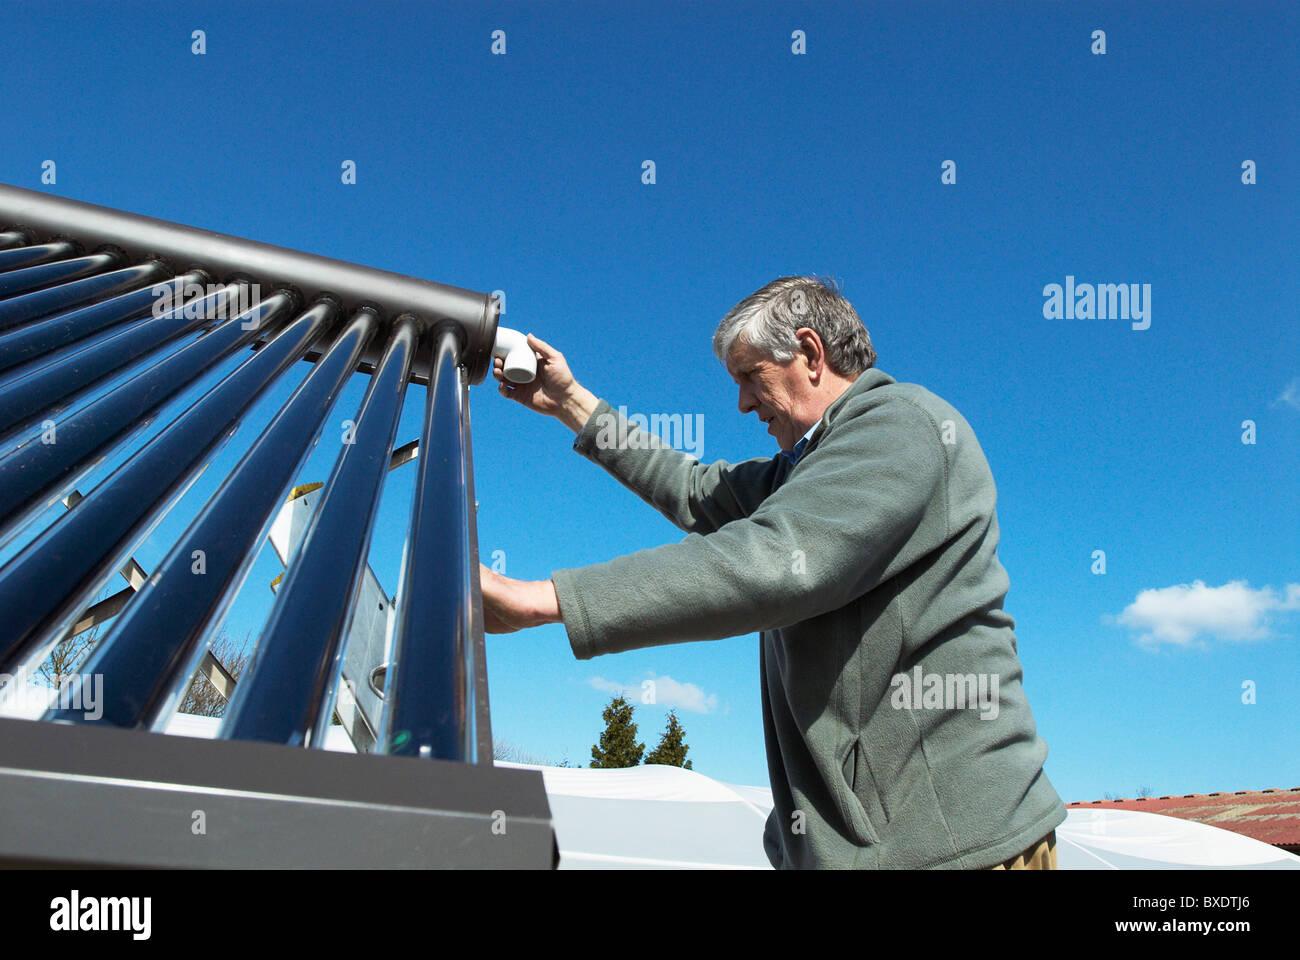 Solar Hot Water Stockfotos & Solar Hot Water Bilder - Alamy